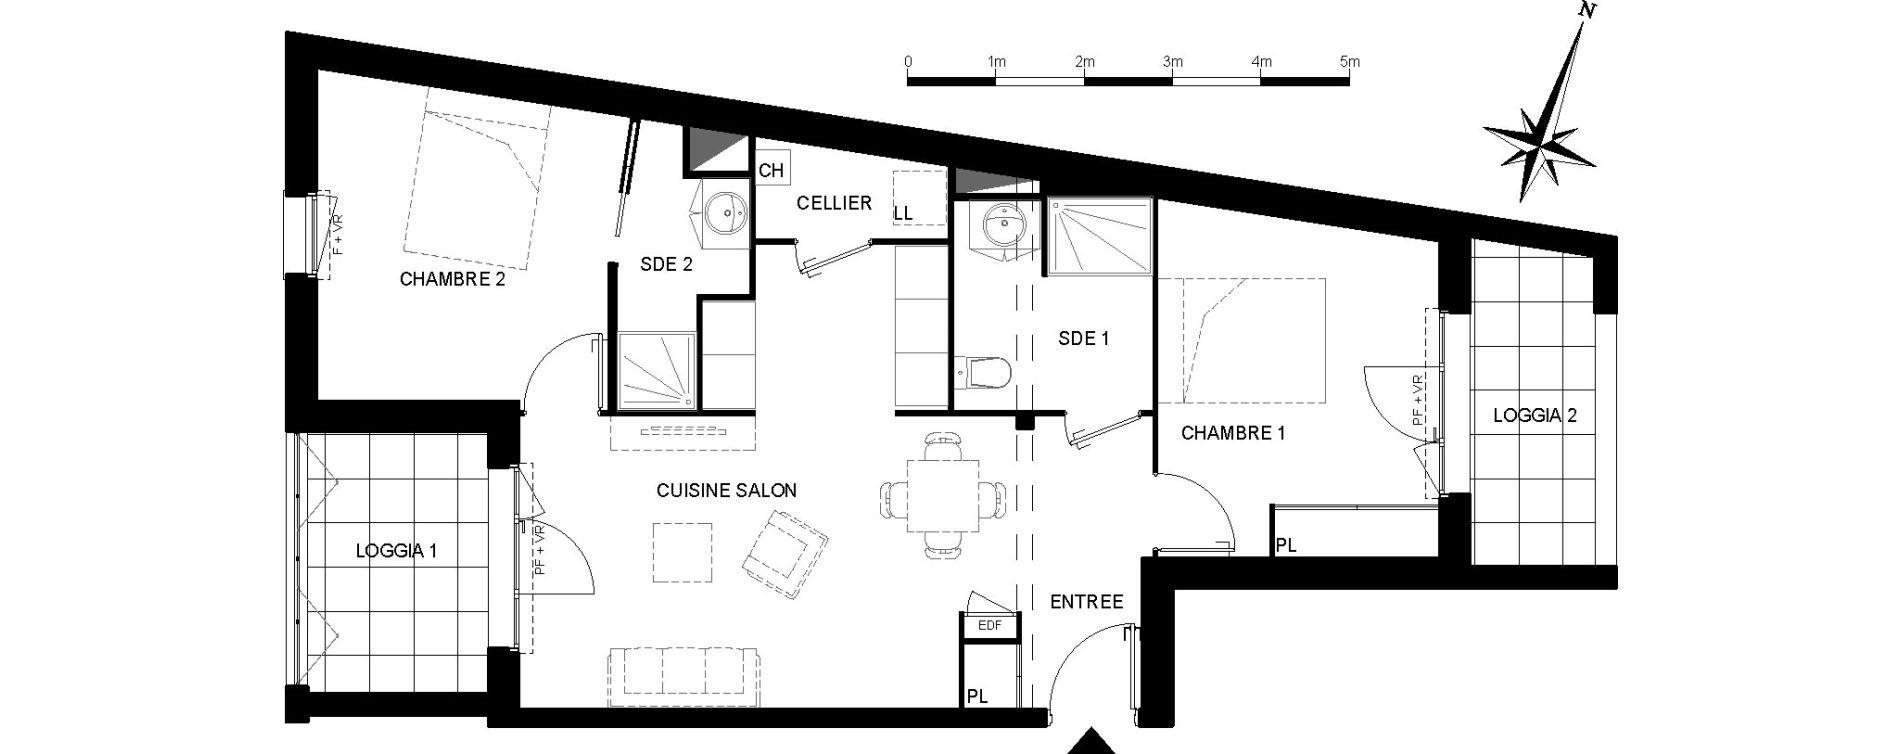 Appartement T3 de 63,67 m2 à Bègles La ferrade